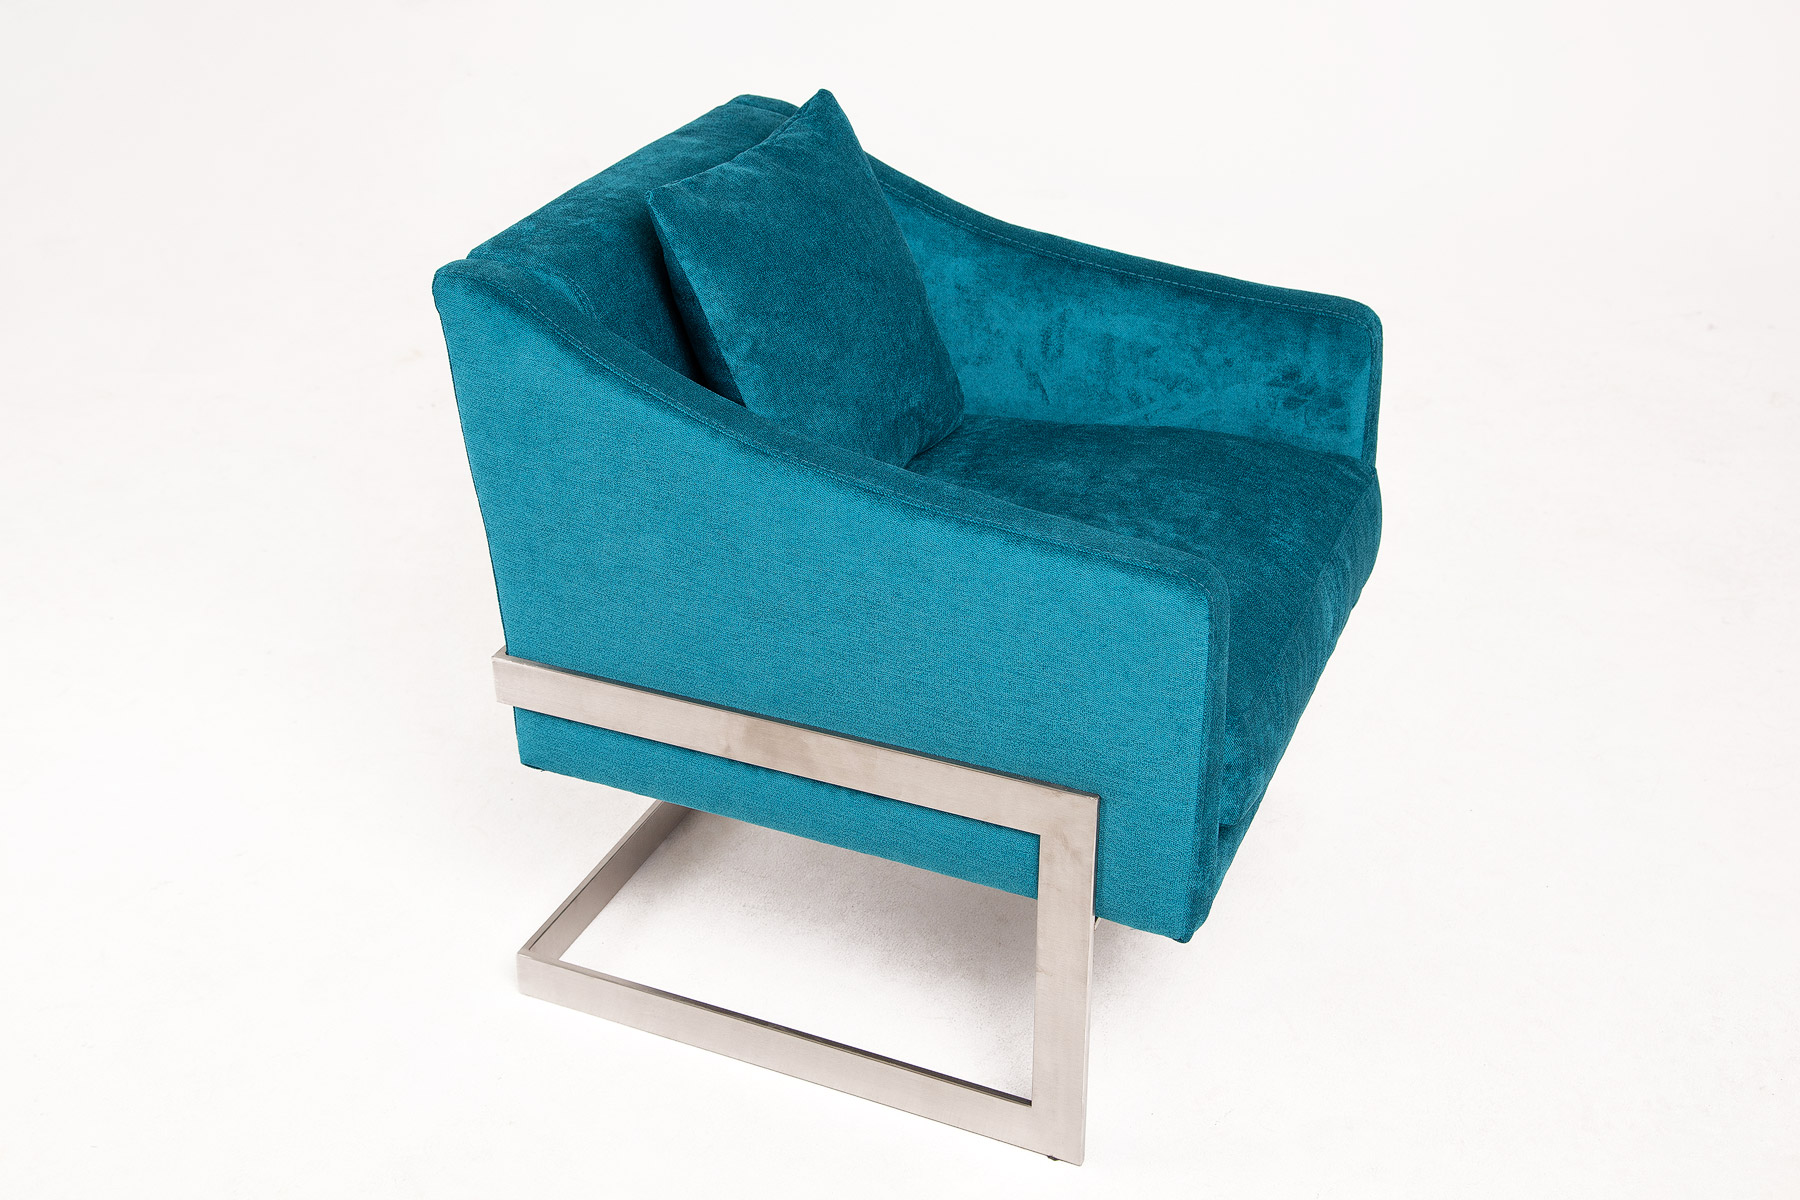 Luxury blue velvet armchair in modern design with steel legs size 69/70/77cm by Urvission Interiors price £749